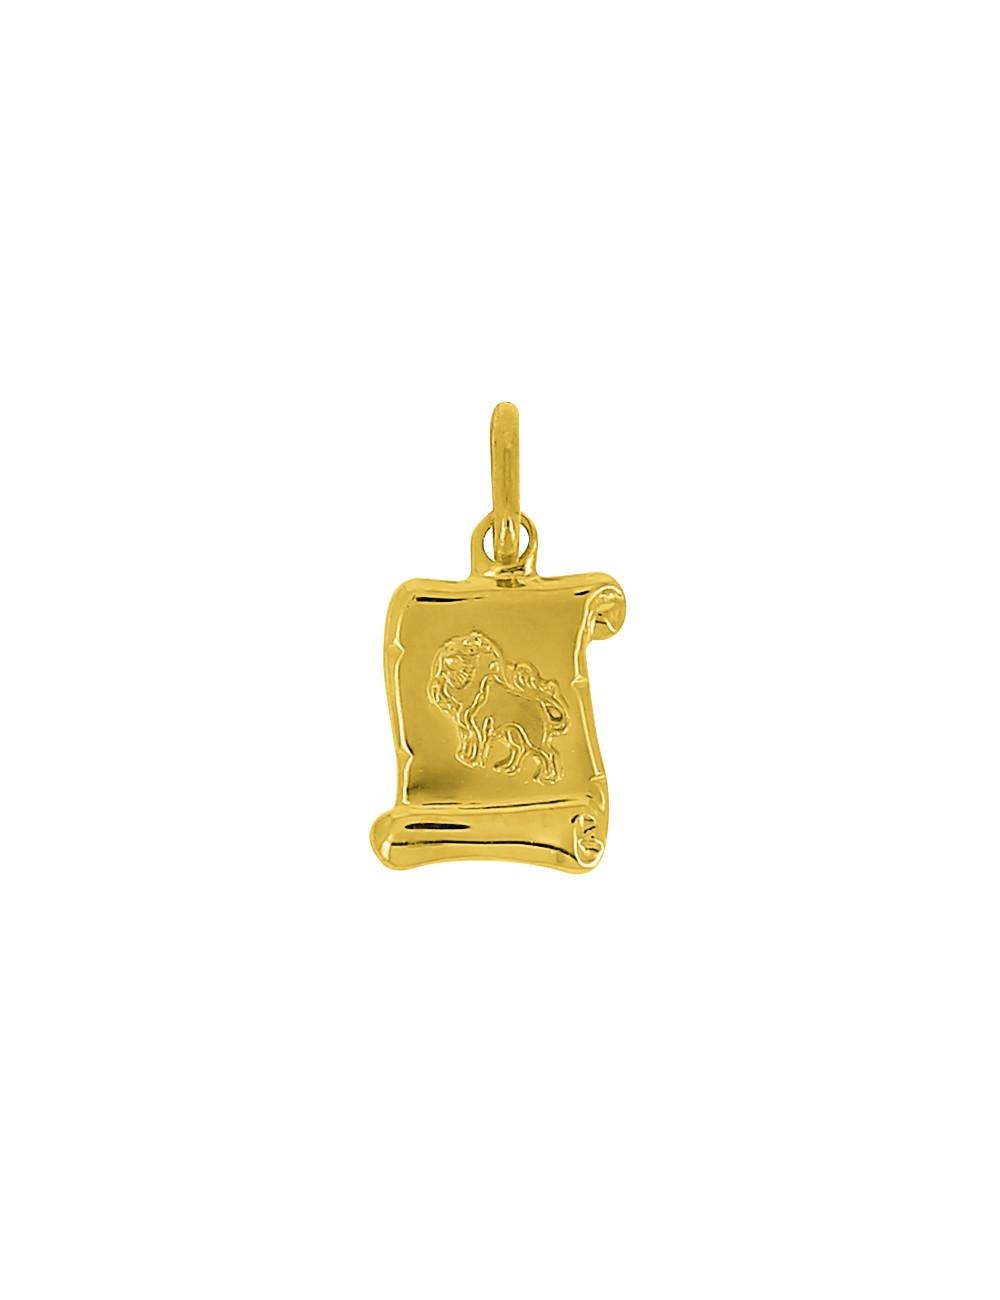 Pendentif Signe Du Zodiaque Lion Or Jaune 18 Carats + Chaine Or Jaune 18 Carats Offerte